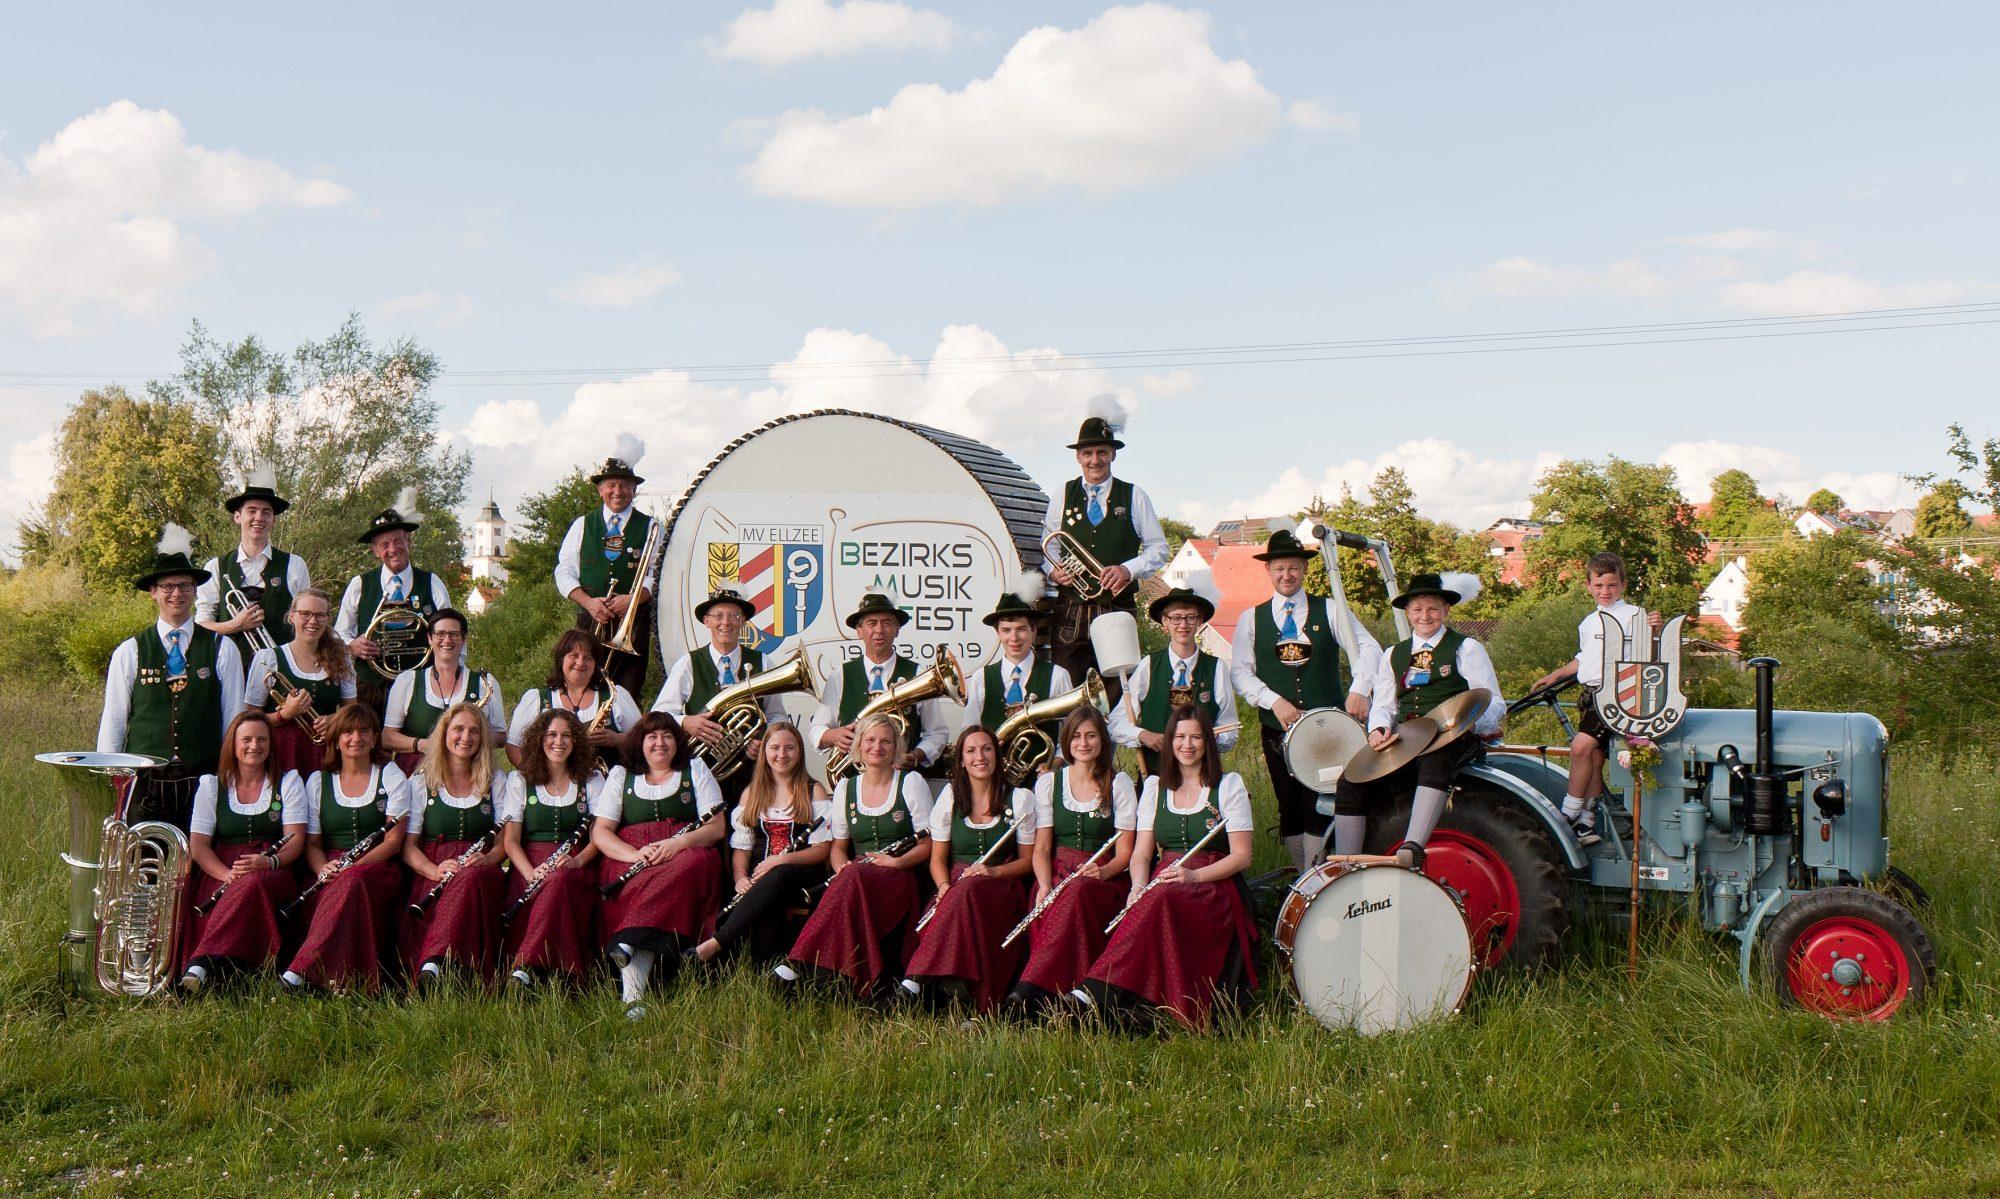 Musikverein Ellzee